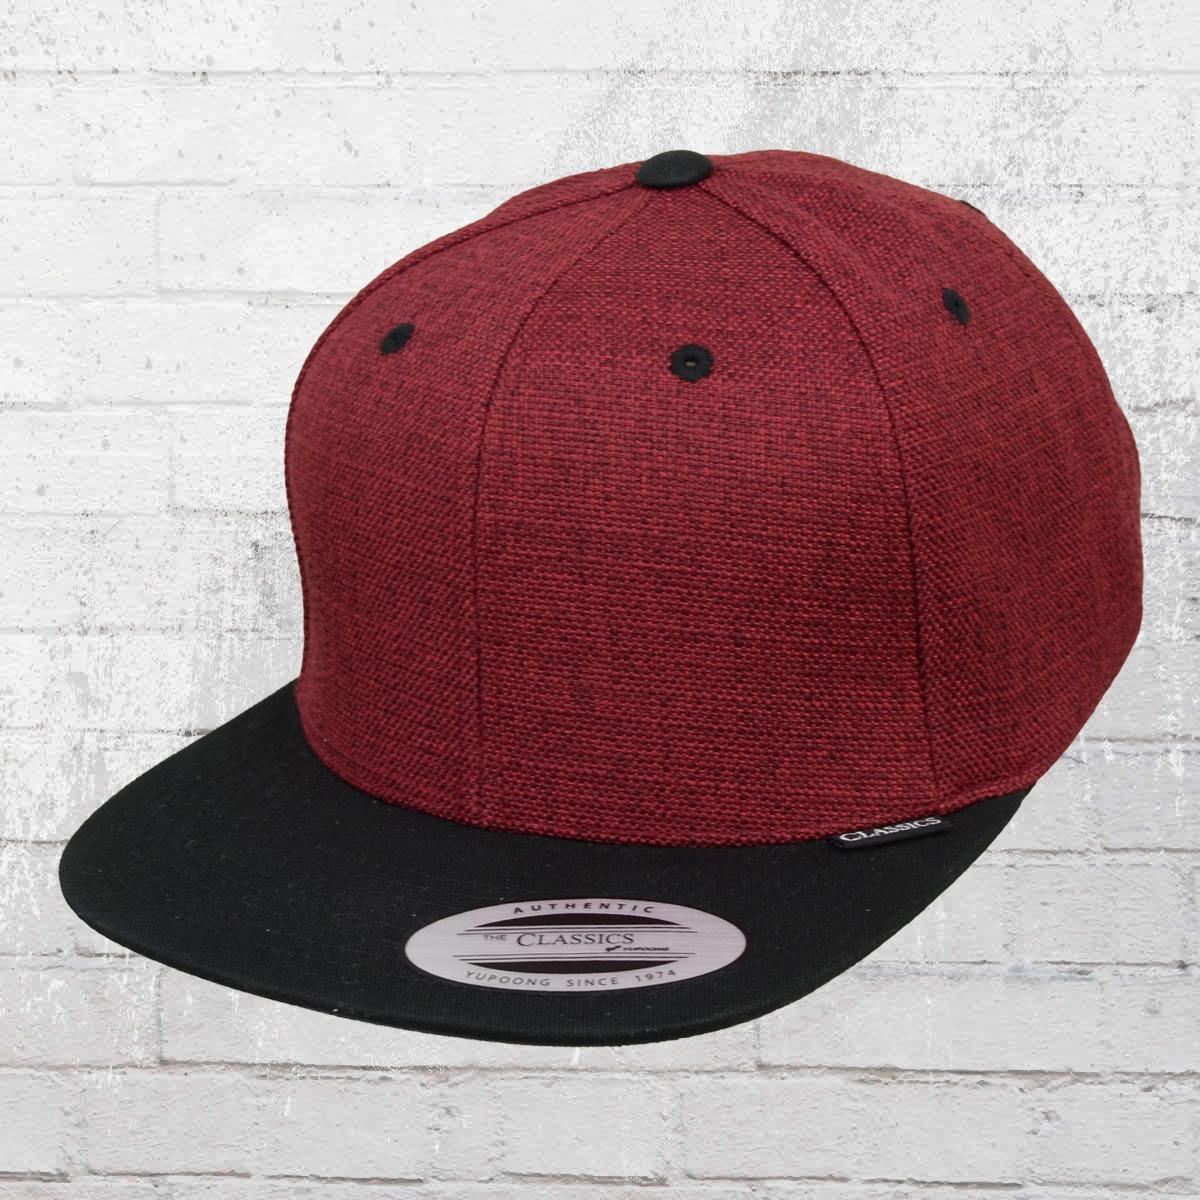 f9c4d73a7c3 Yupoong by Flexfit Classic Snapback Melange 2-Tone Snapback Cap red black